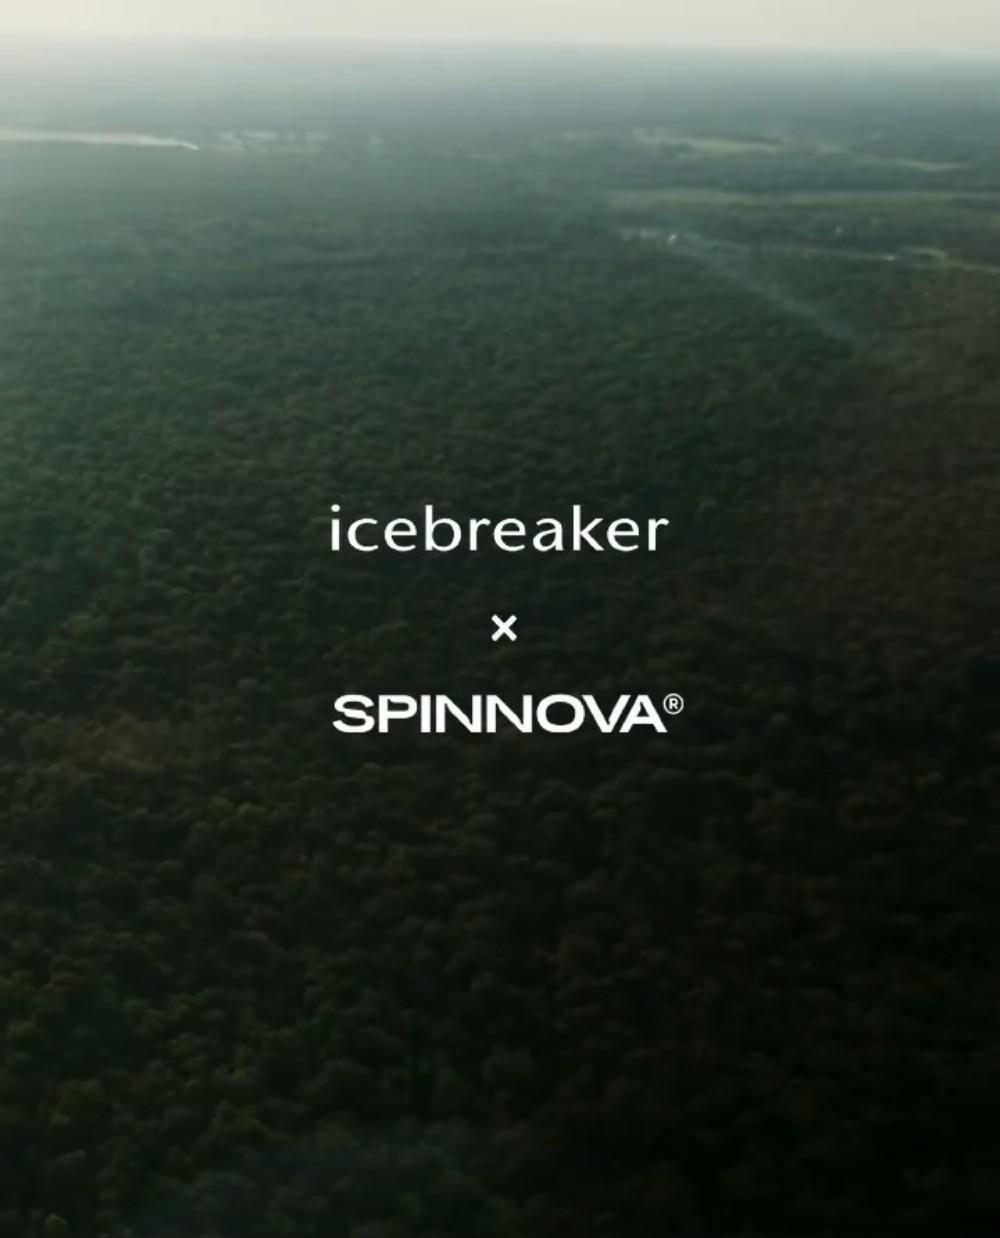 Icebreaker has partnered with material maker Spinnova to create a fully circular merino wool fiber.